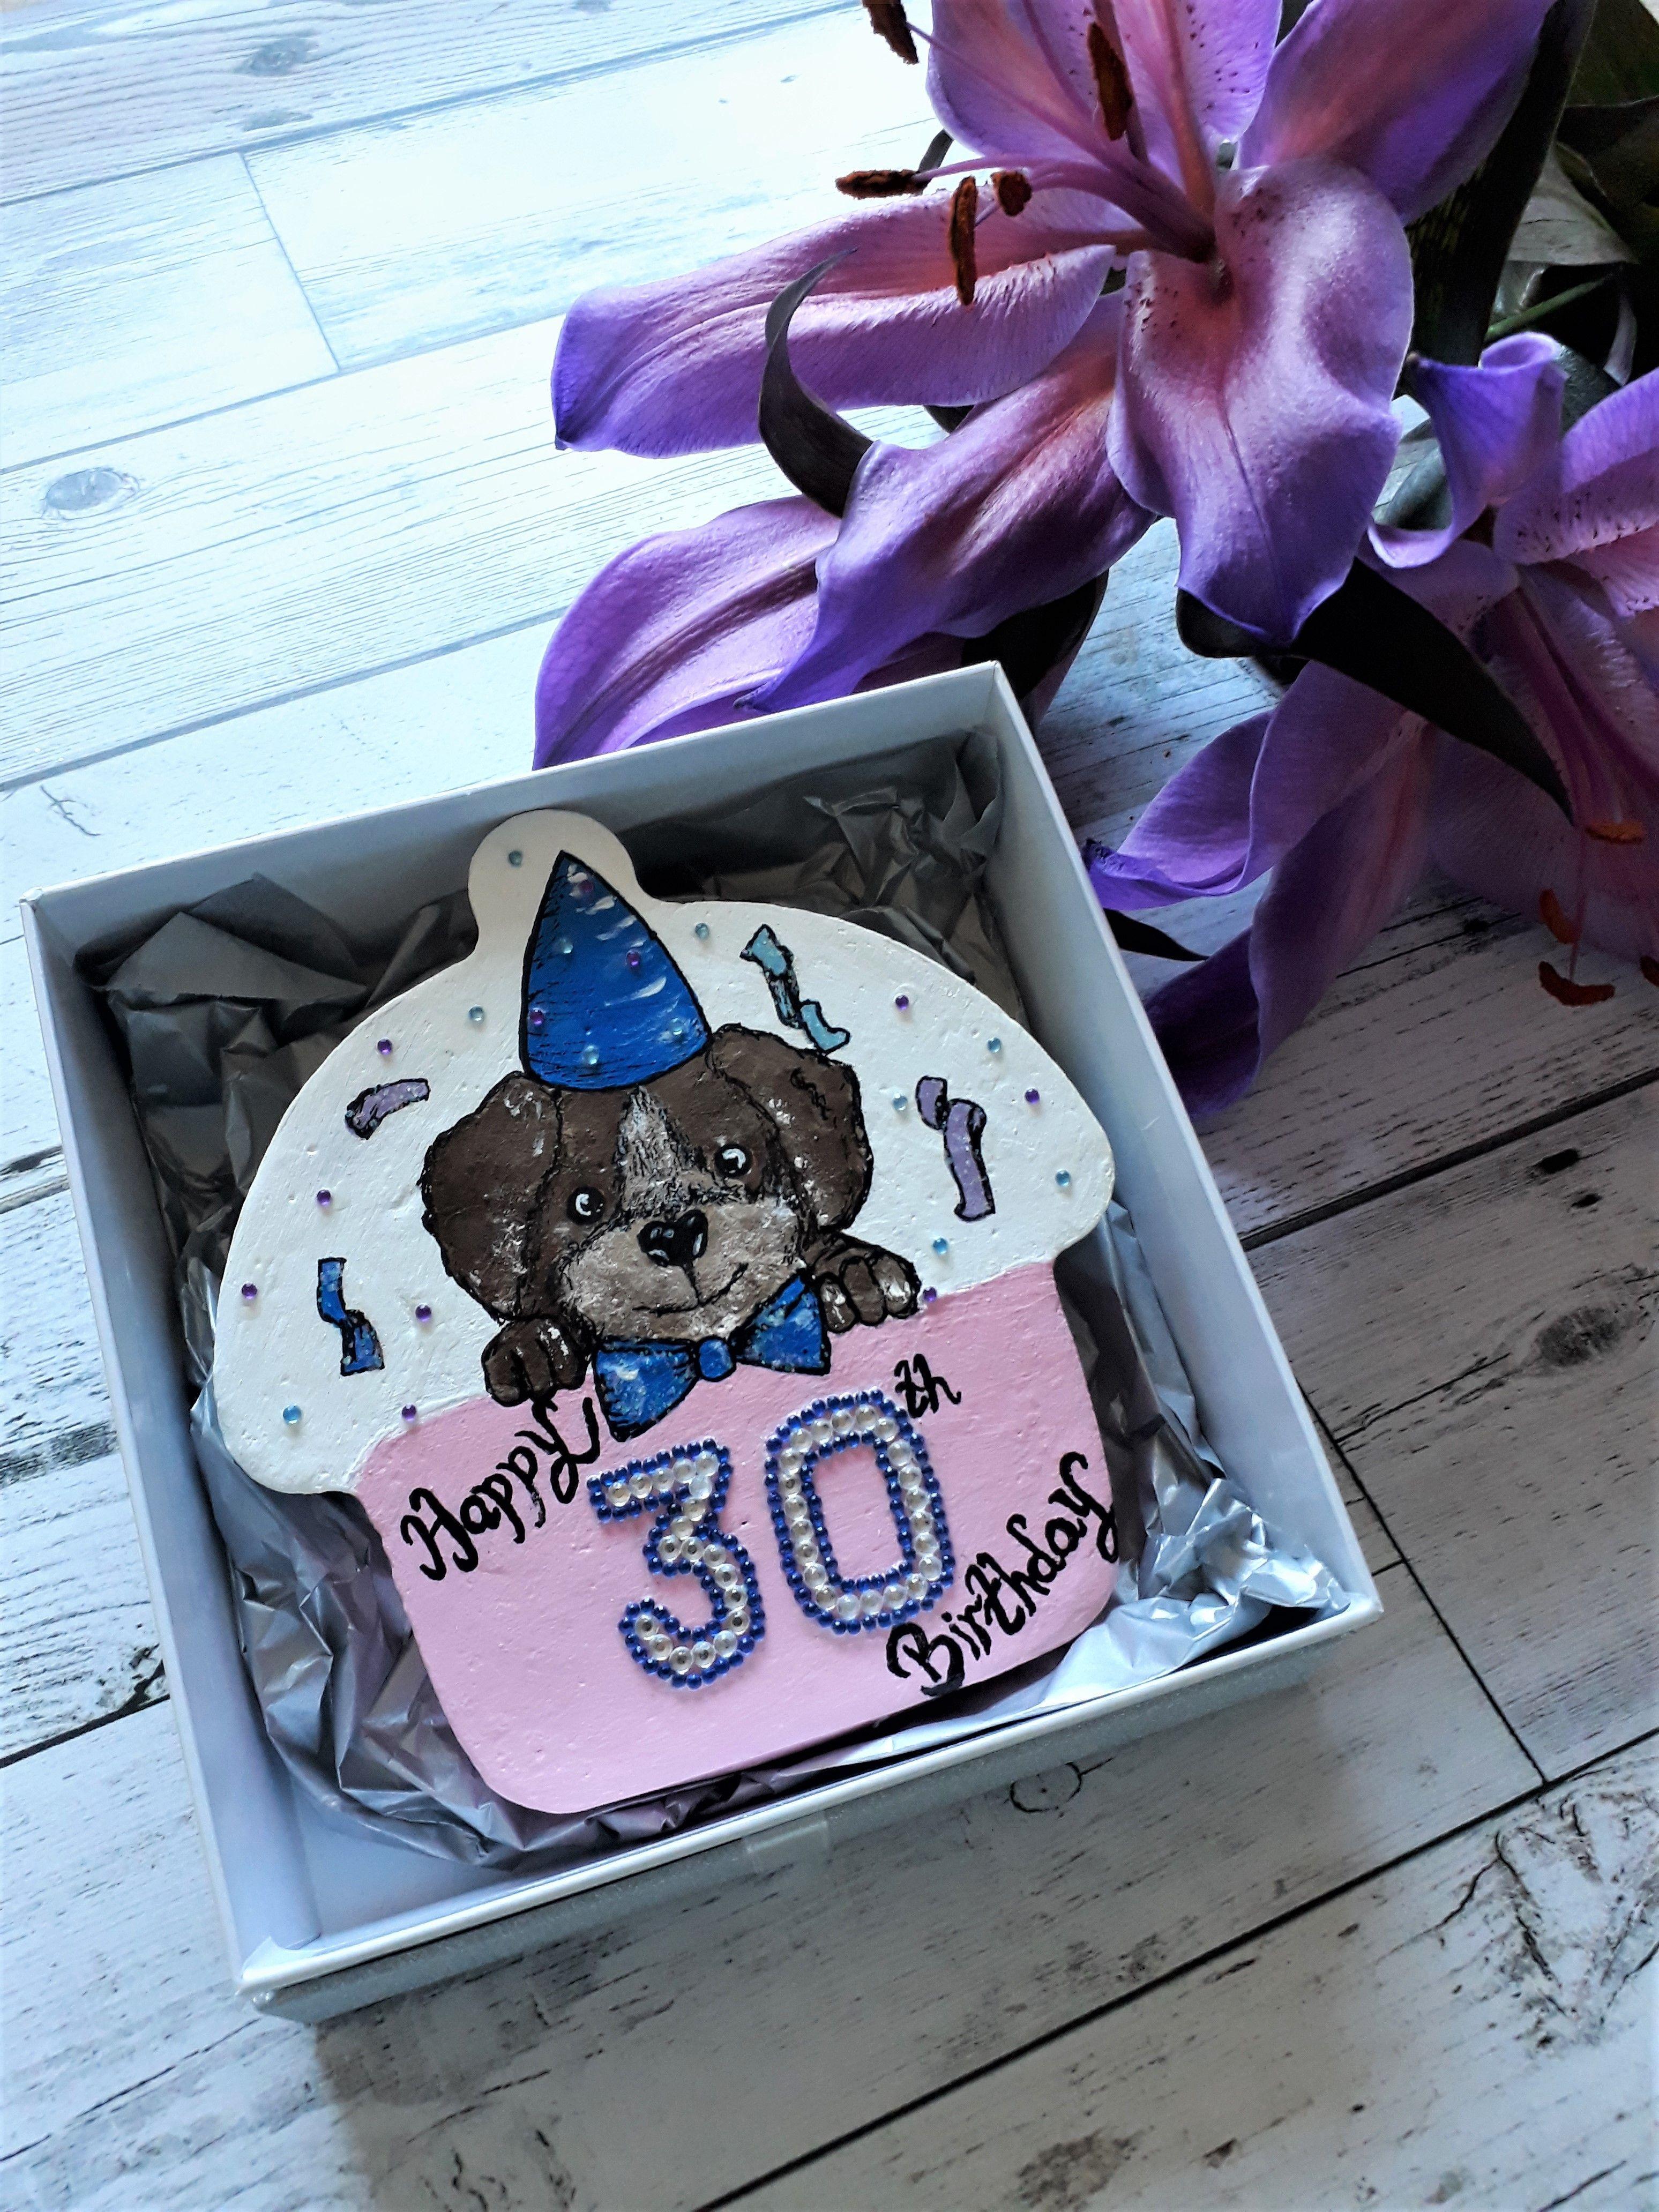 30th Birthday Keepsake Gift Cupcake Shape Pebble Comes In A Box Ready For Giving 30thgift Birthdaykeepsake Birthdaygifts